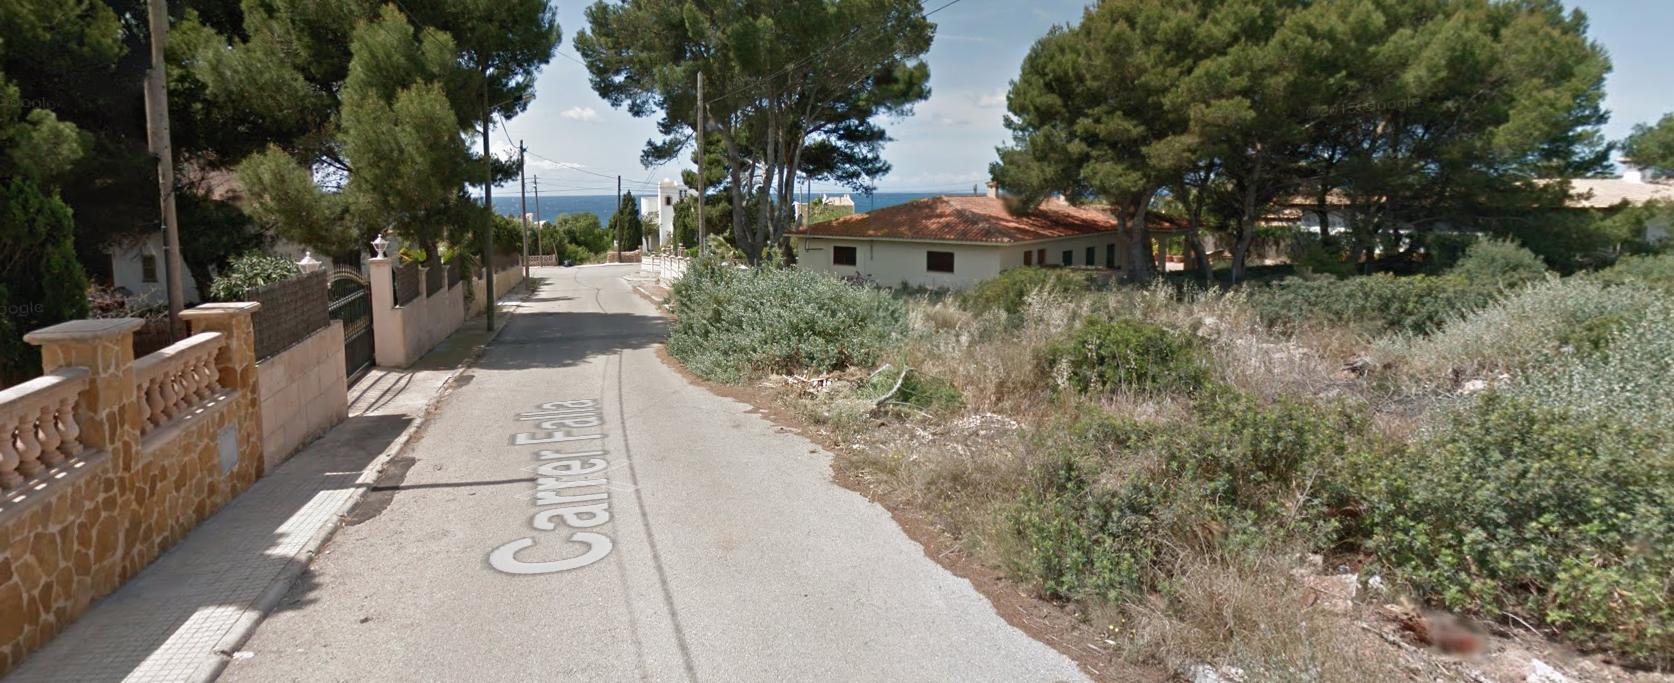 Link zu Google Street View Falla 12 Meerblick